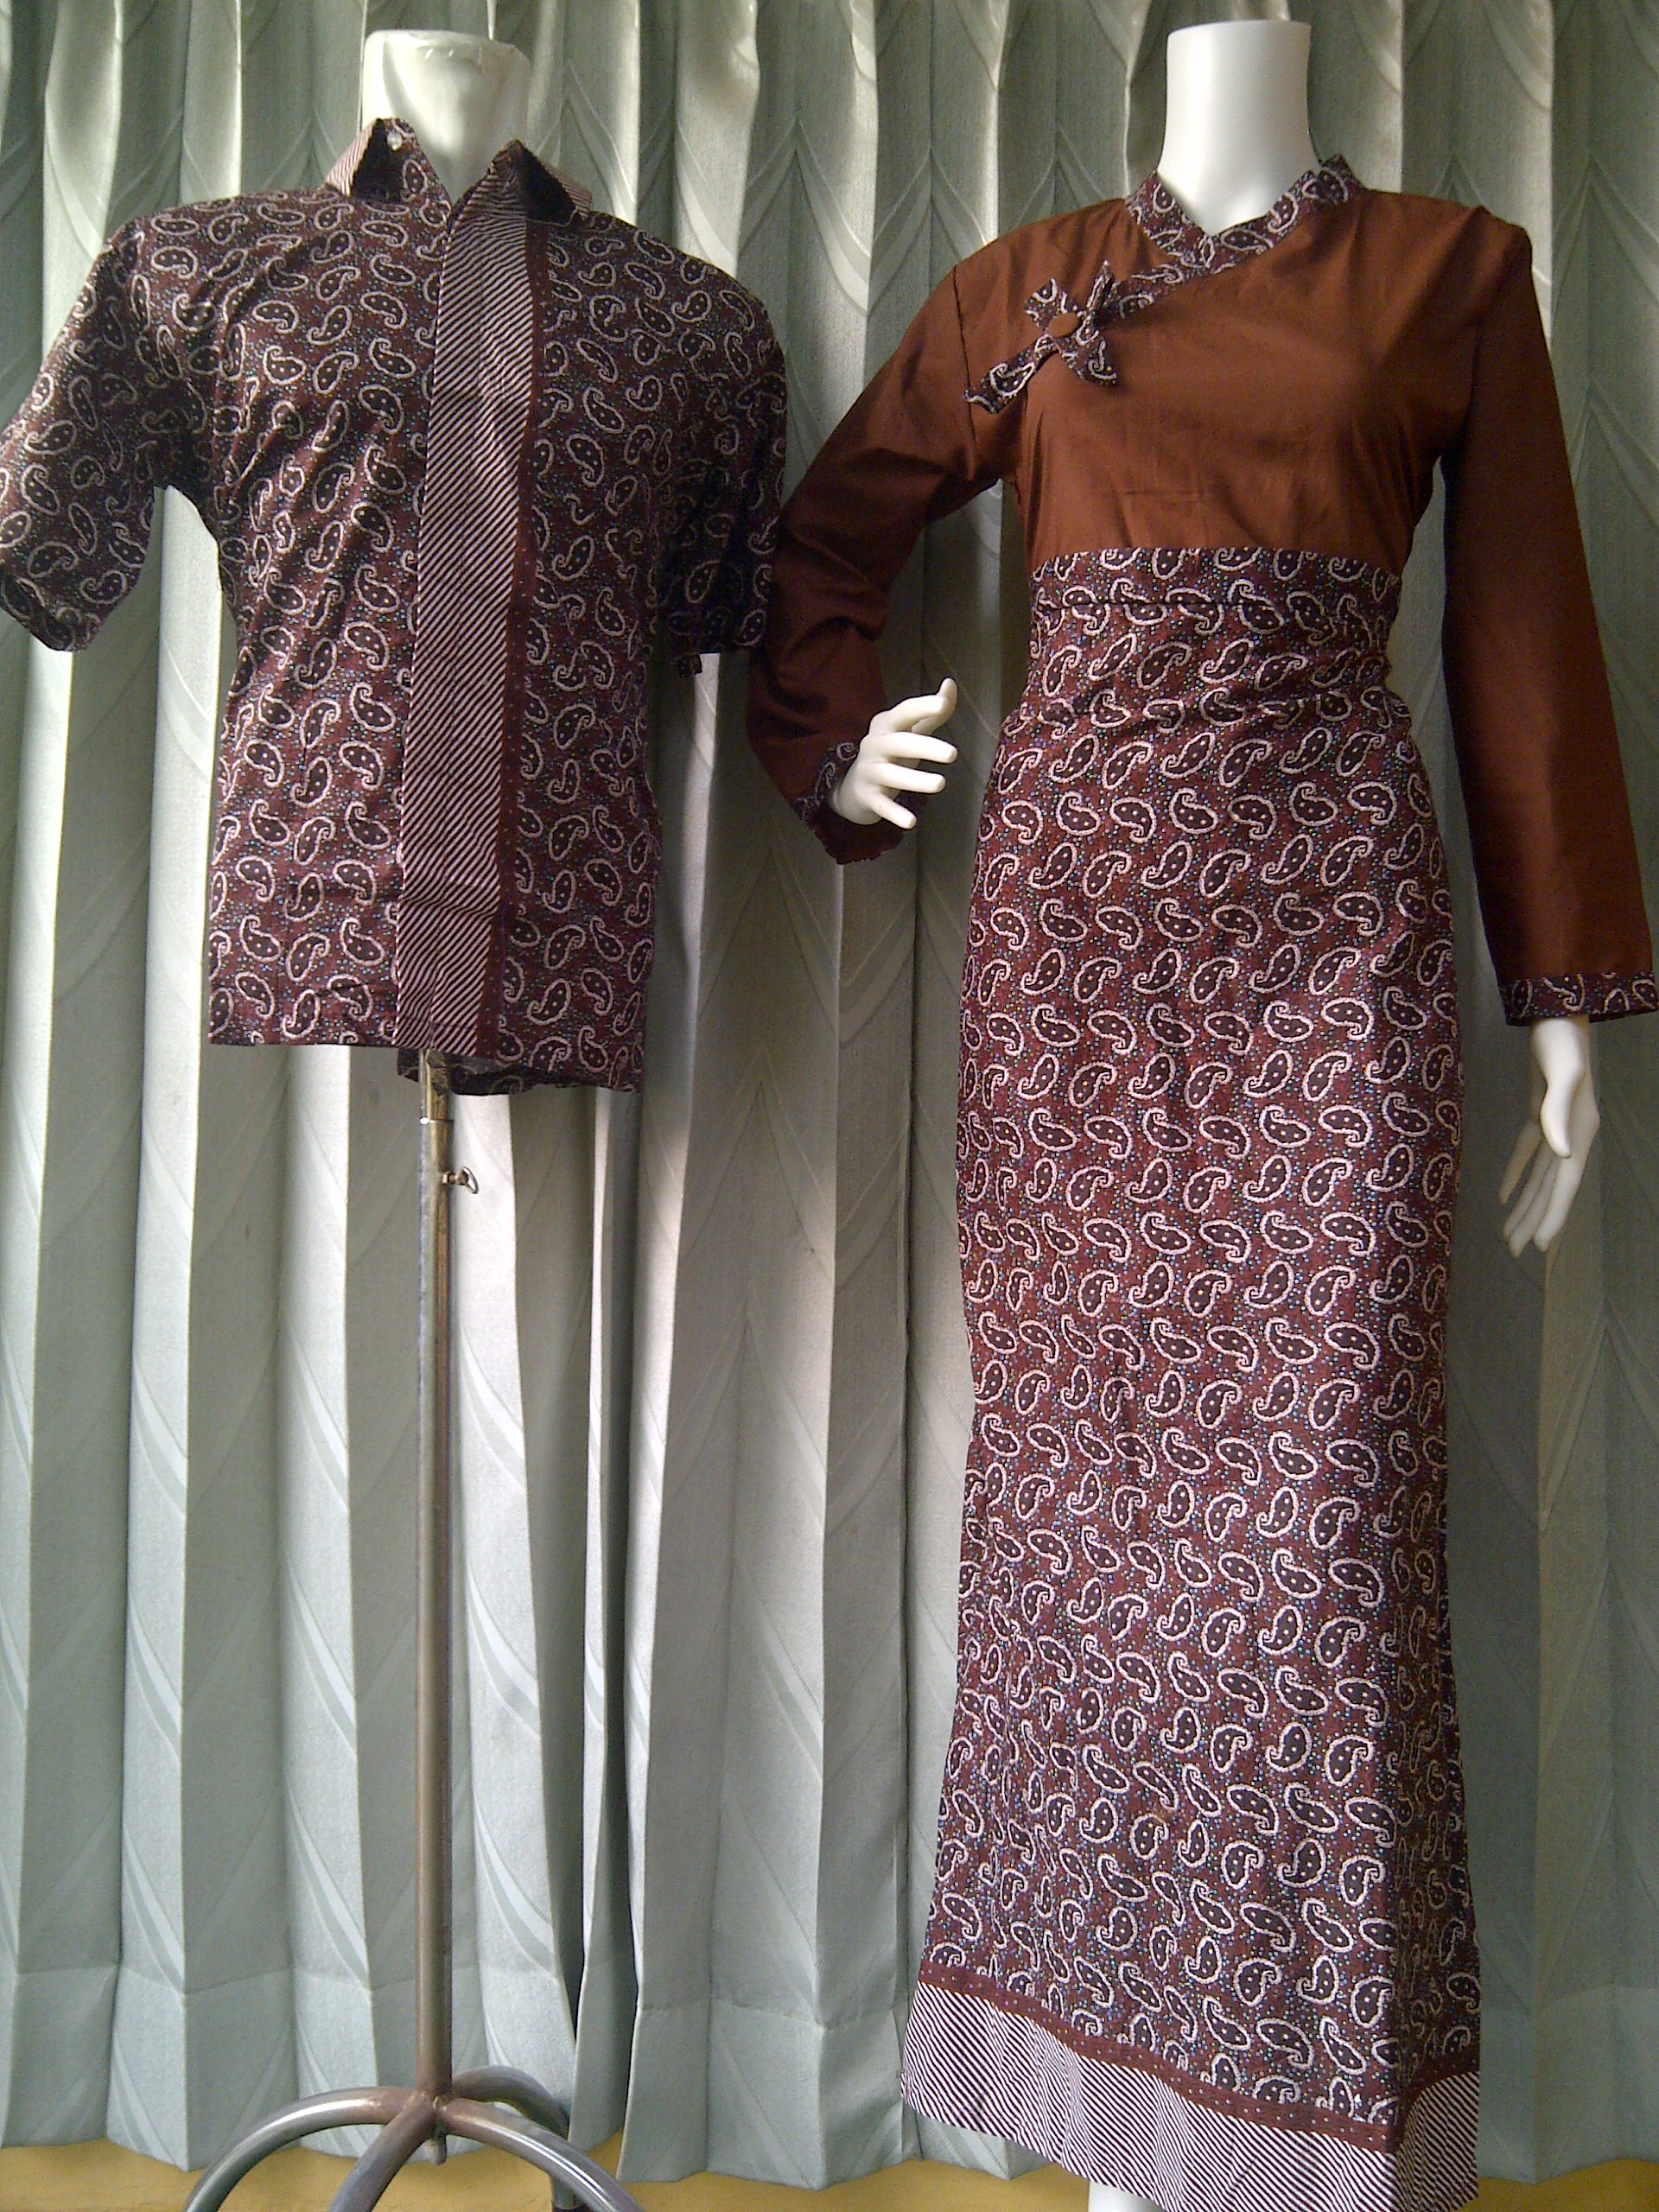 Grosir Batik Gamis Batik Dress Batik Batik Sarimbit